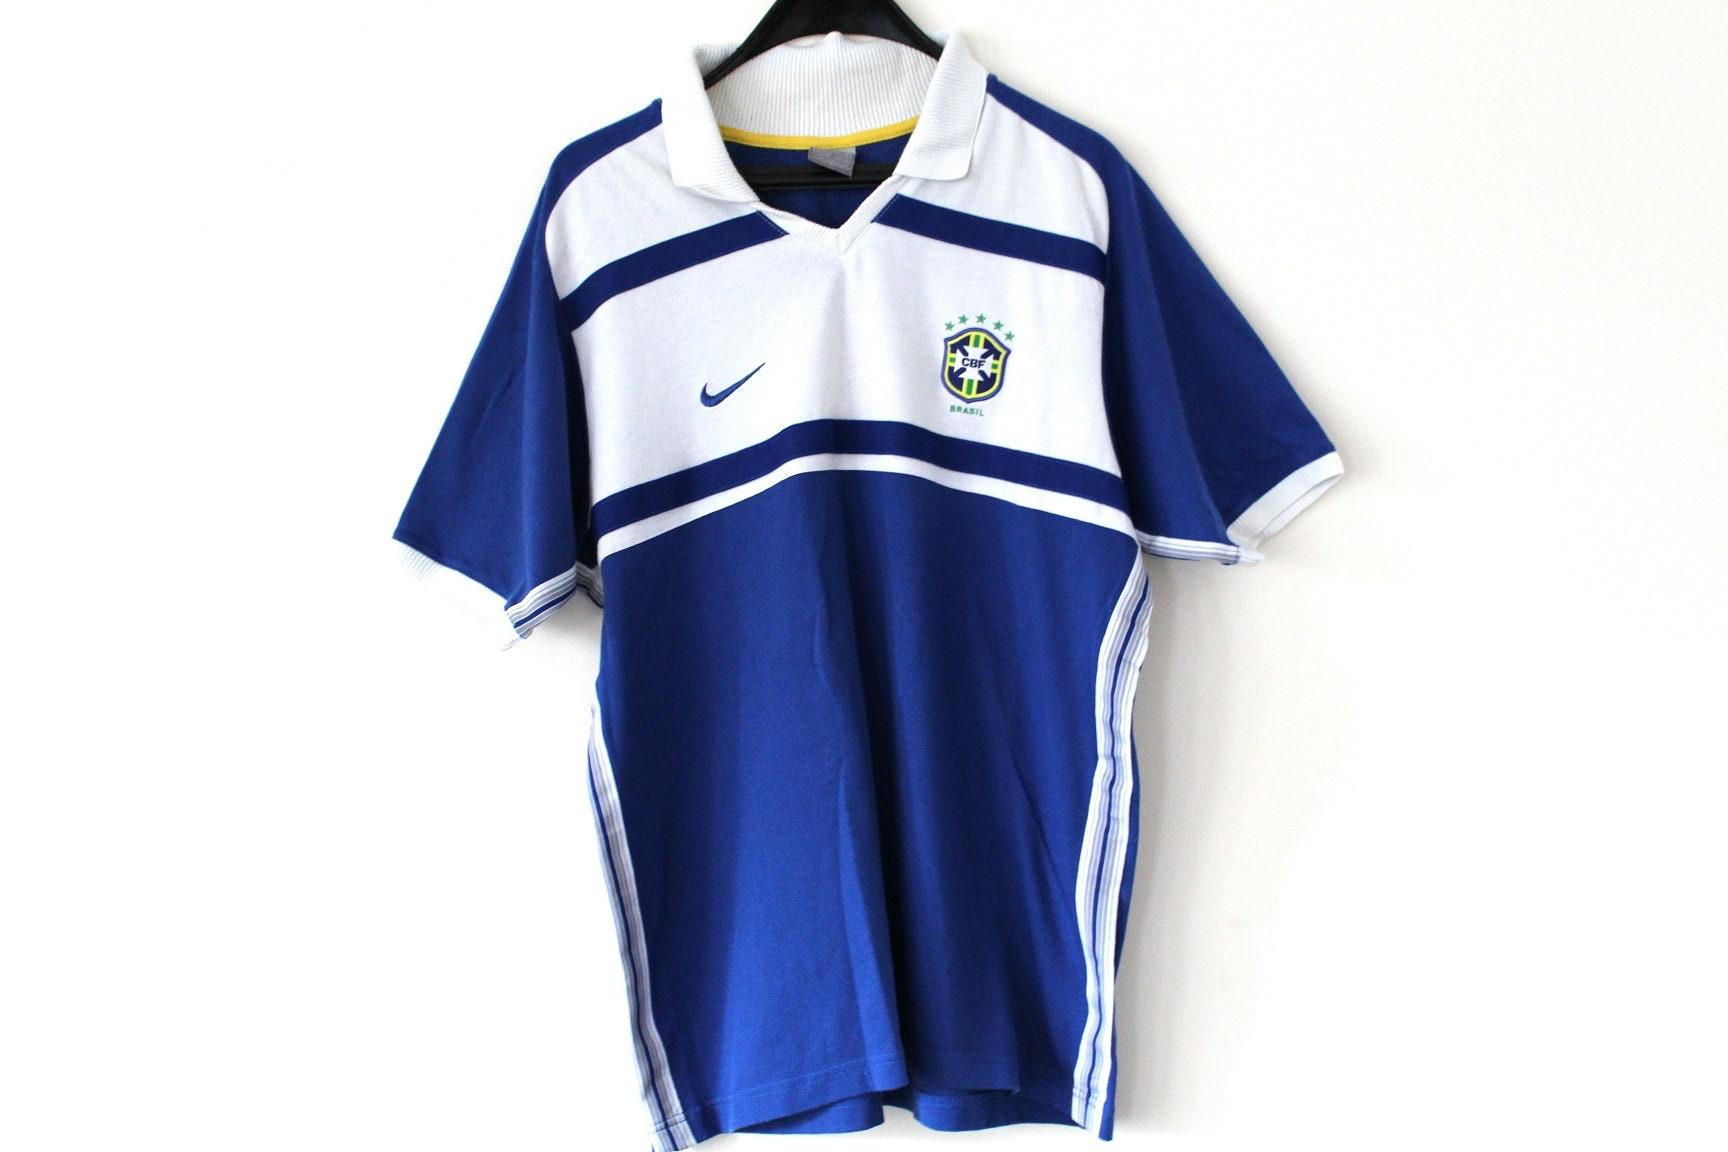 Vintage Brasil Football Shirt 90s Nike Football Shirt Blue White Soccer T-shirt Soccer Tshirt Hip Hop Streetwear Activewear Size Xl Unisex Tshirt